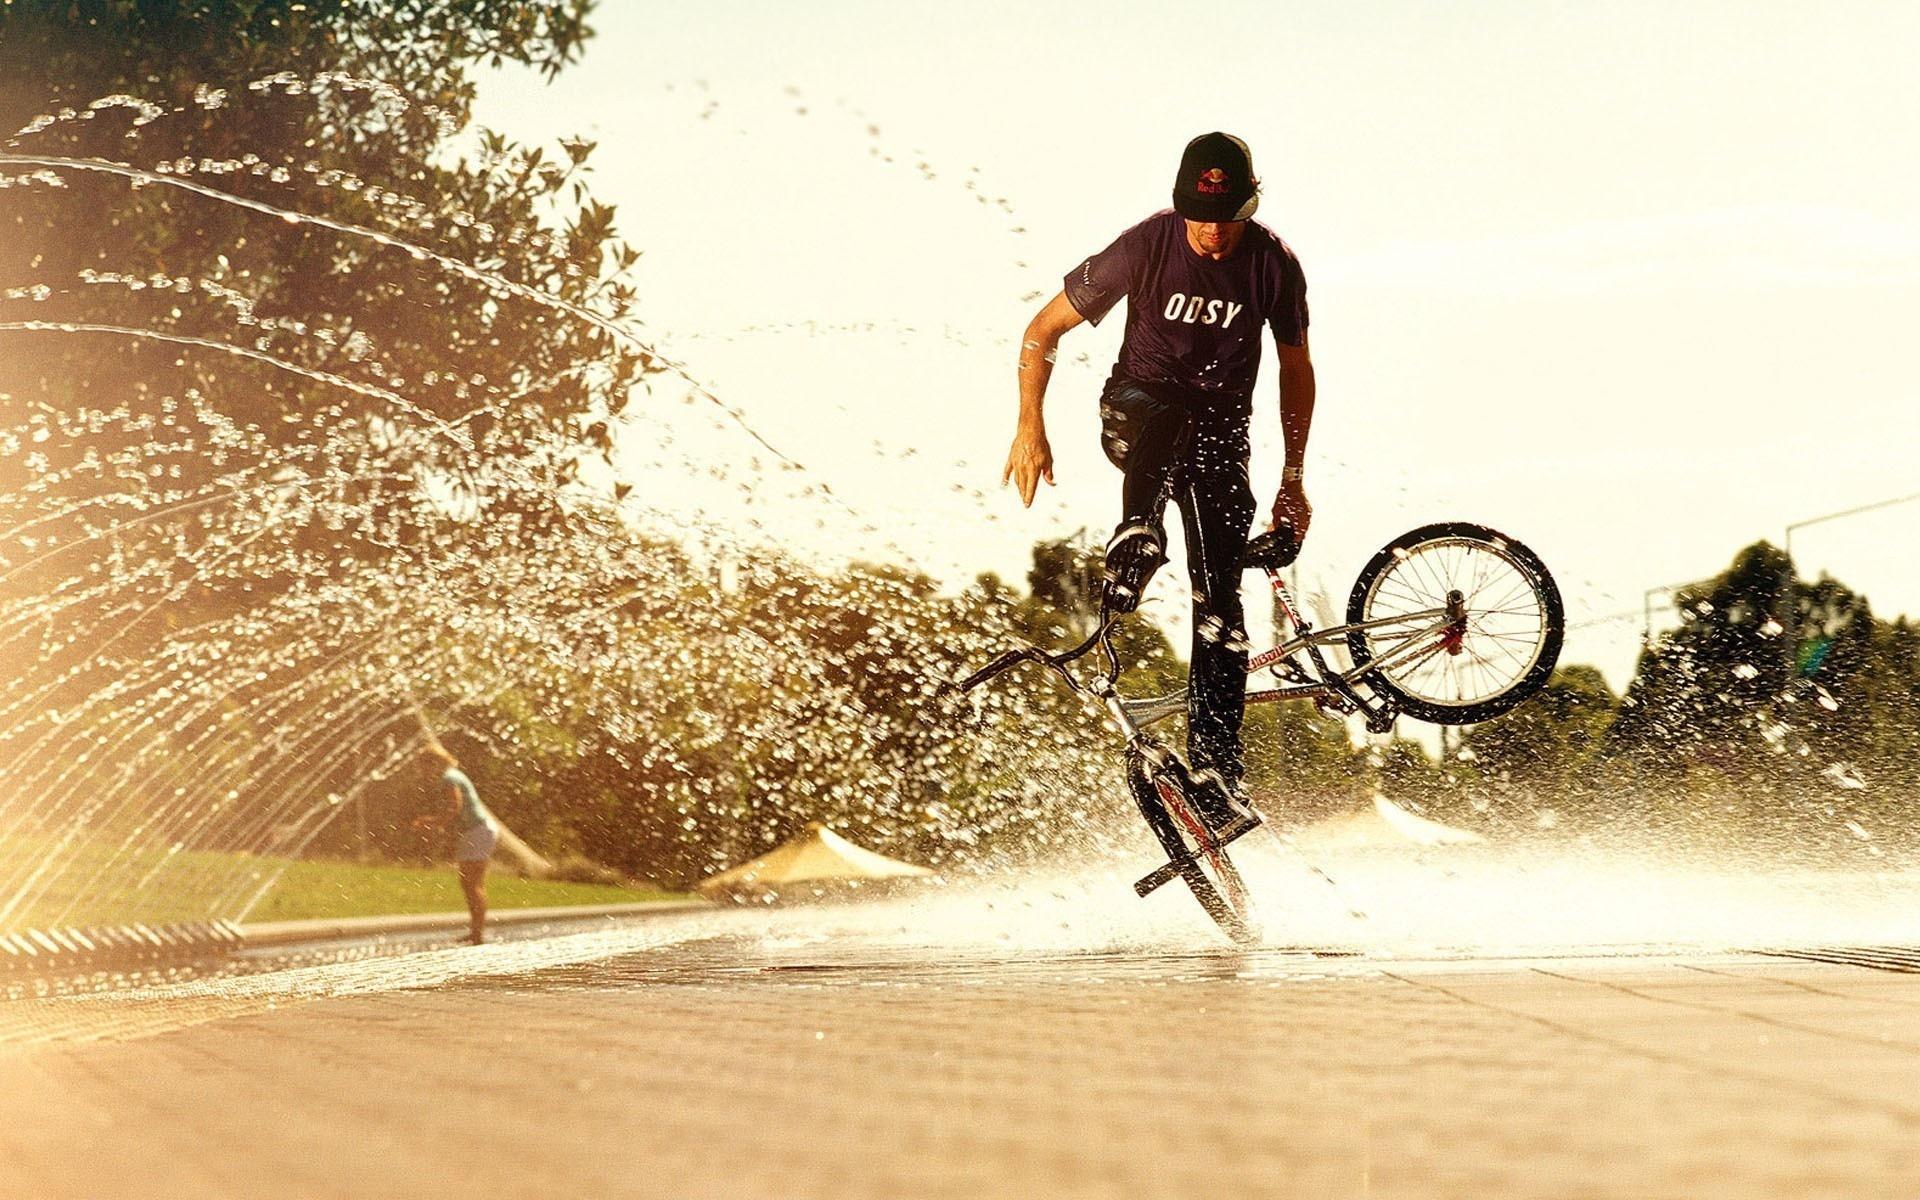 велосипед, велосипедист, колеса